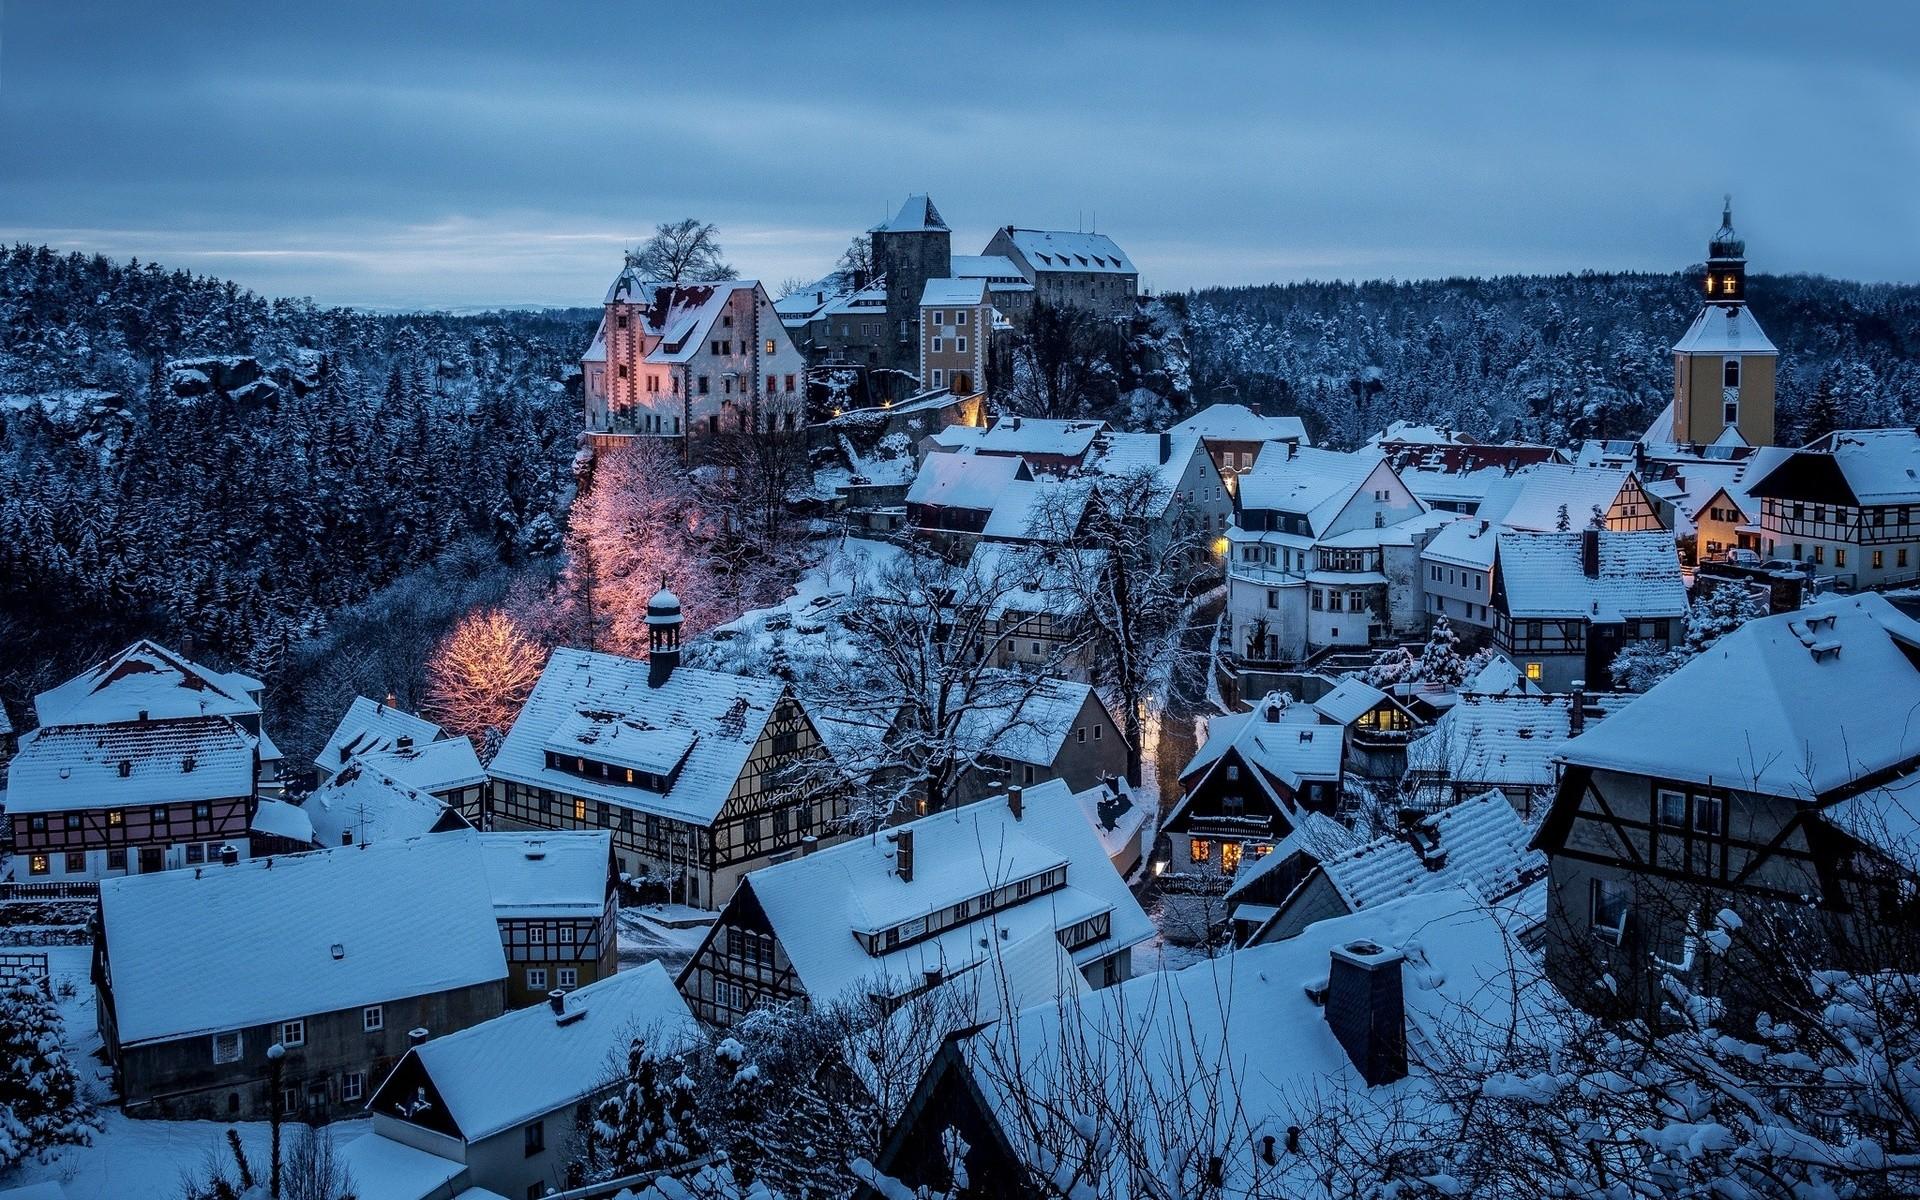 Honshtayn Saxon Sachsische schweiz Germany town winter snow night sky roof  wallpaper | | 32031 | WallpaperUP